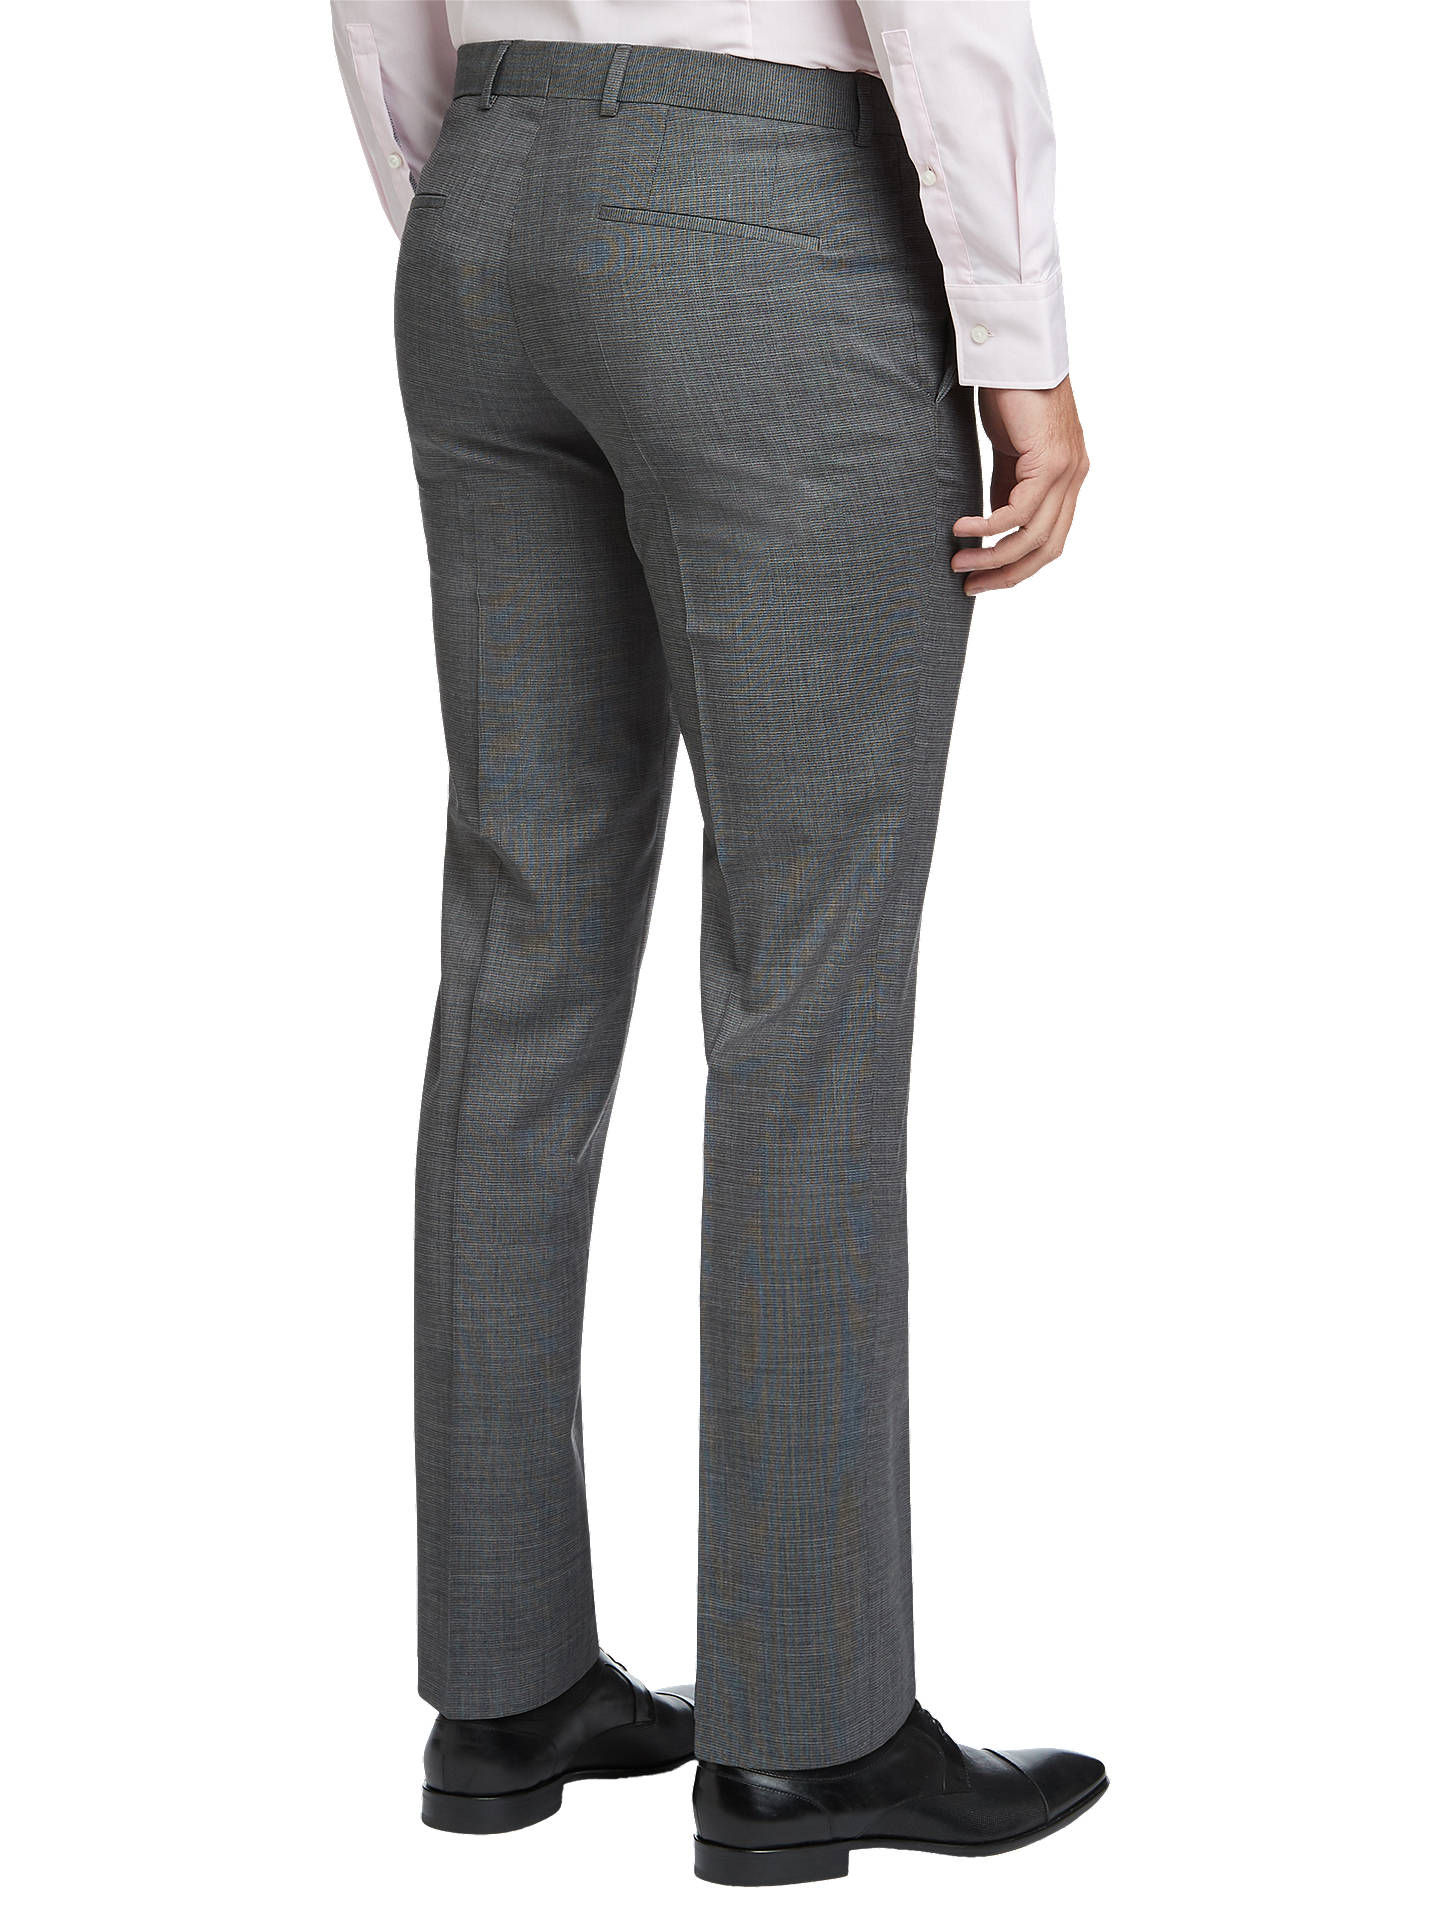 c238a178b ... Buy HUGO by Hugo Boss Henry/Griffin Virgin Wool Slim Fit Suit Trousers,  Open ...